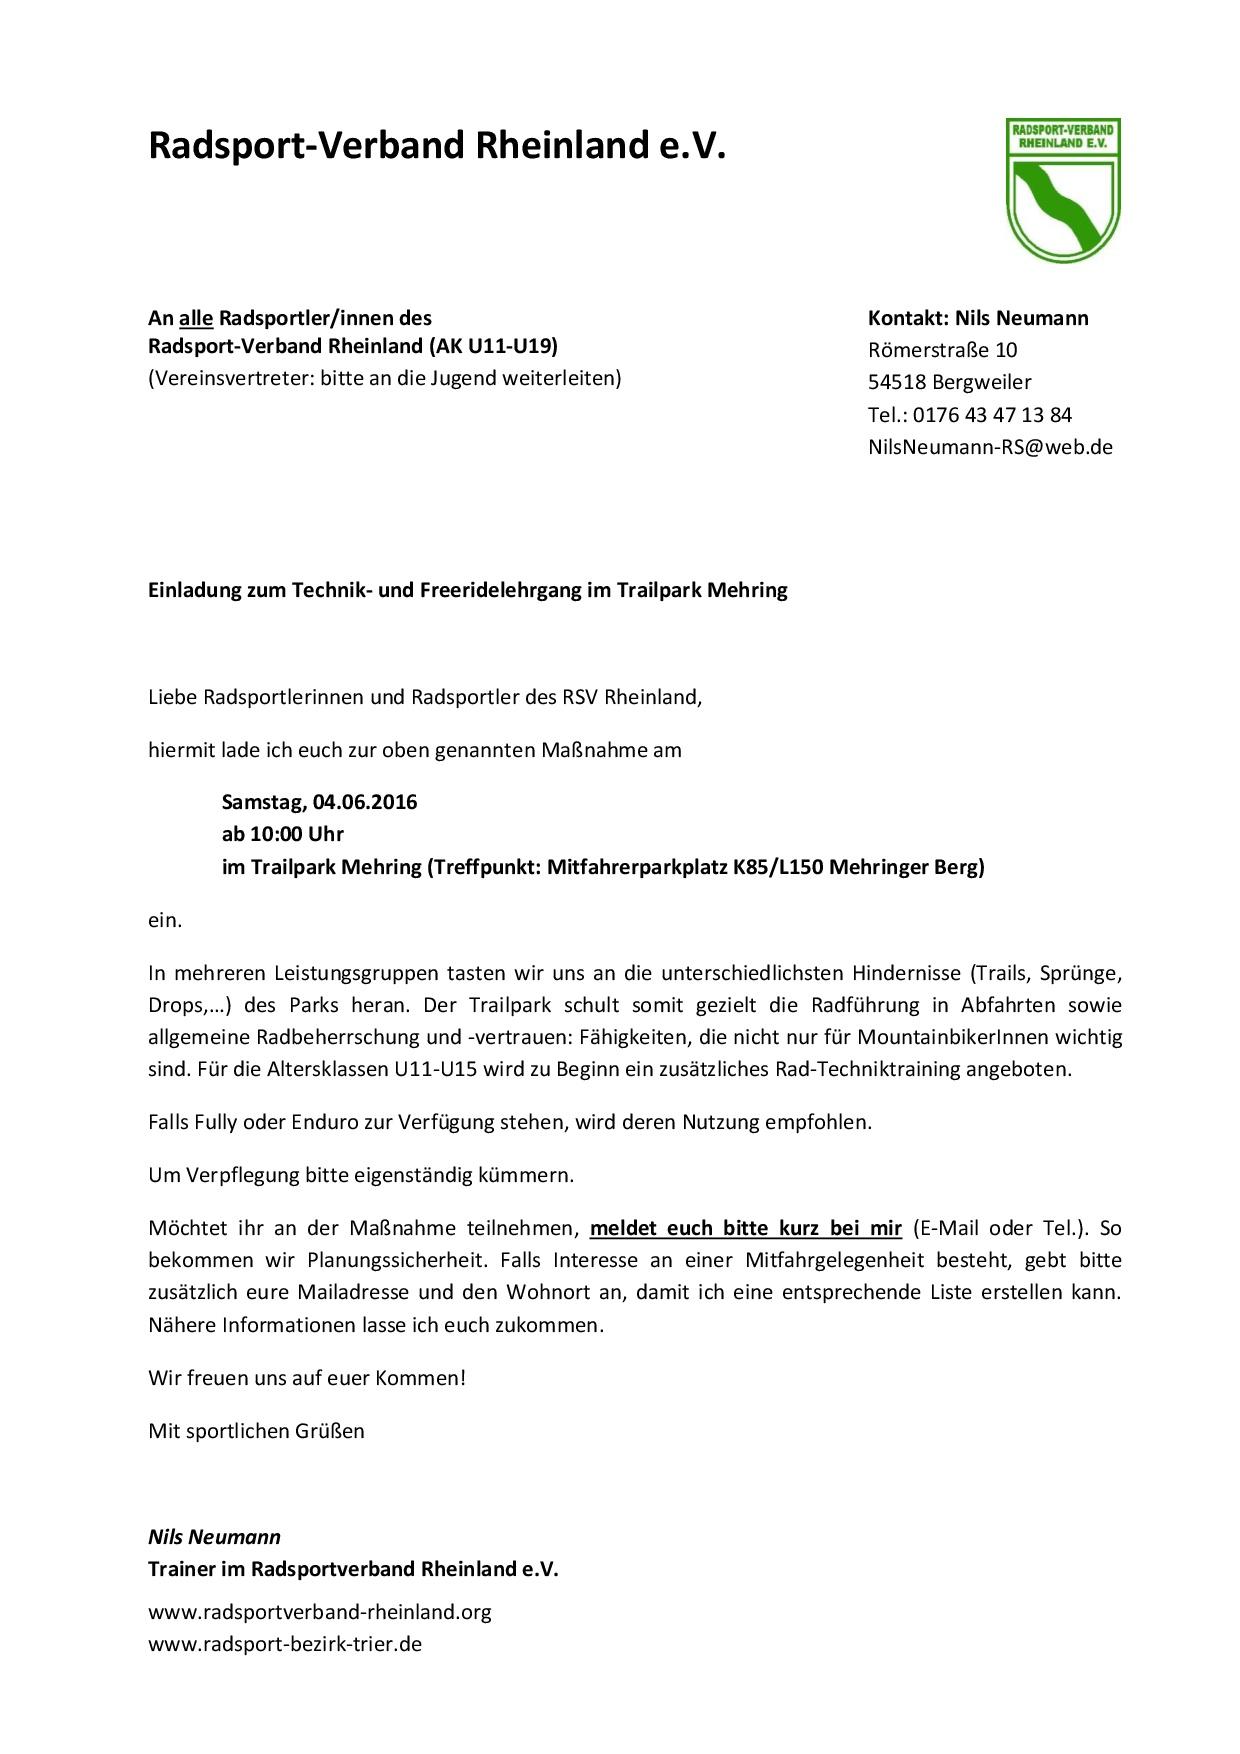 Technik- und Freeridelehrgang im Trailpark Mehring (04.06.16)